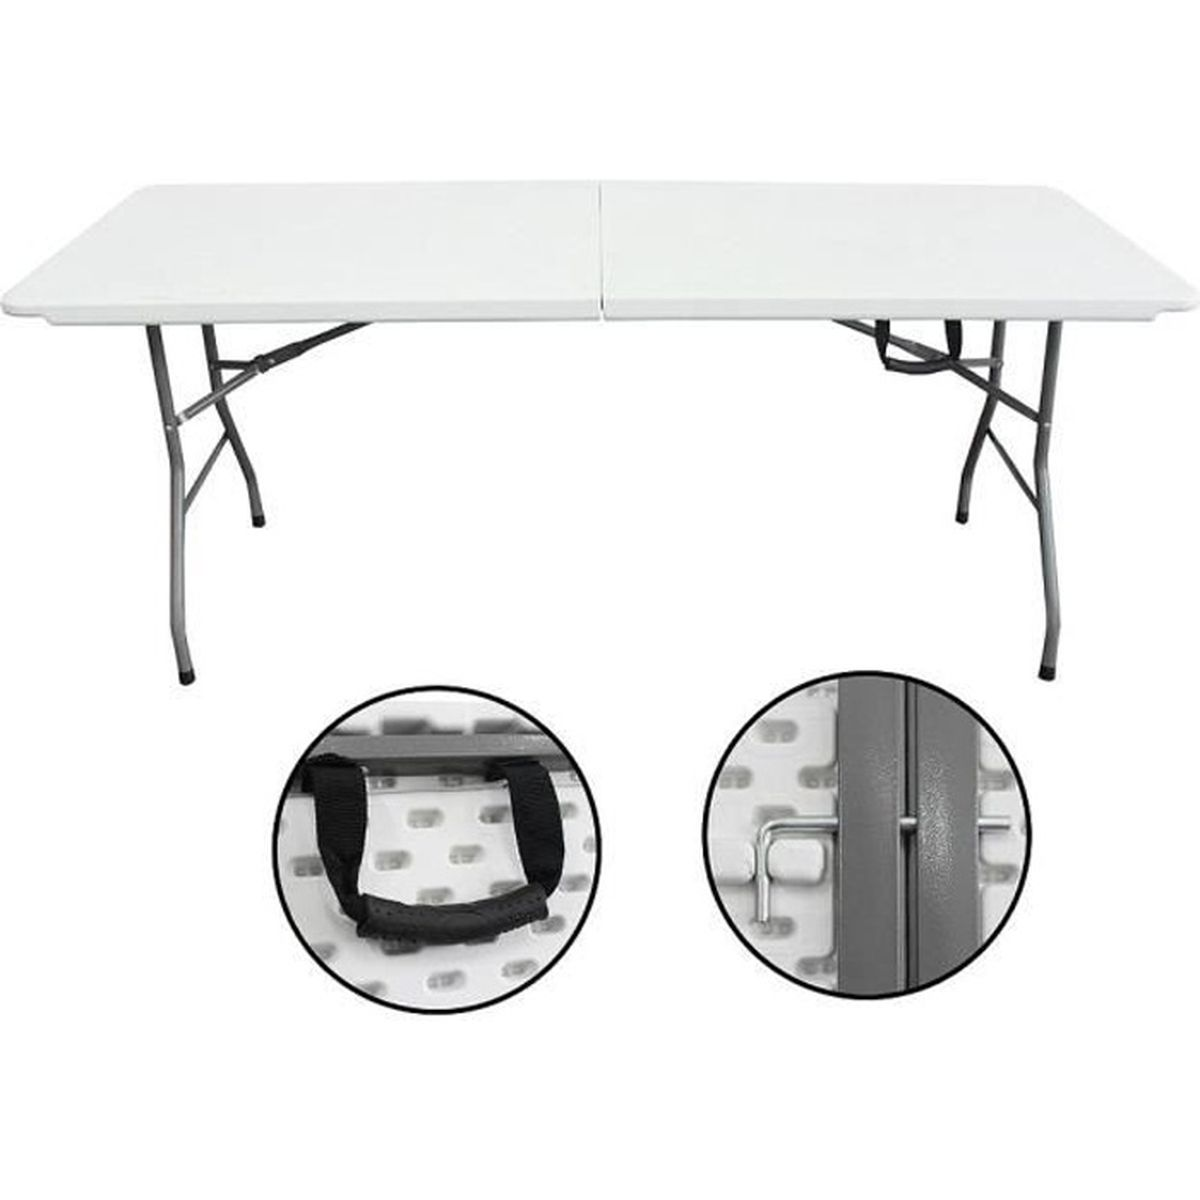 Table de Jardin terrasse Deuba Table de Camping • 240 cm ...